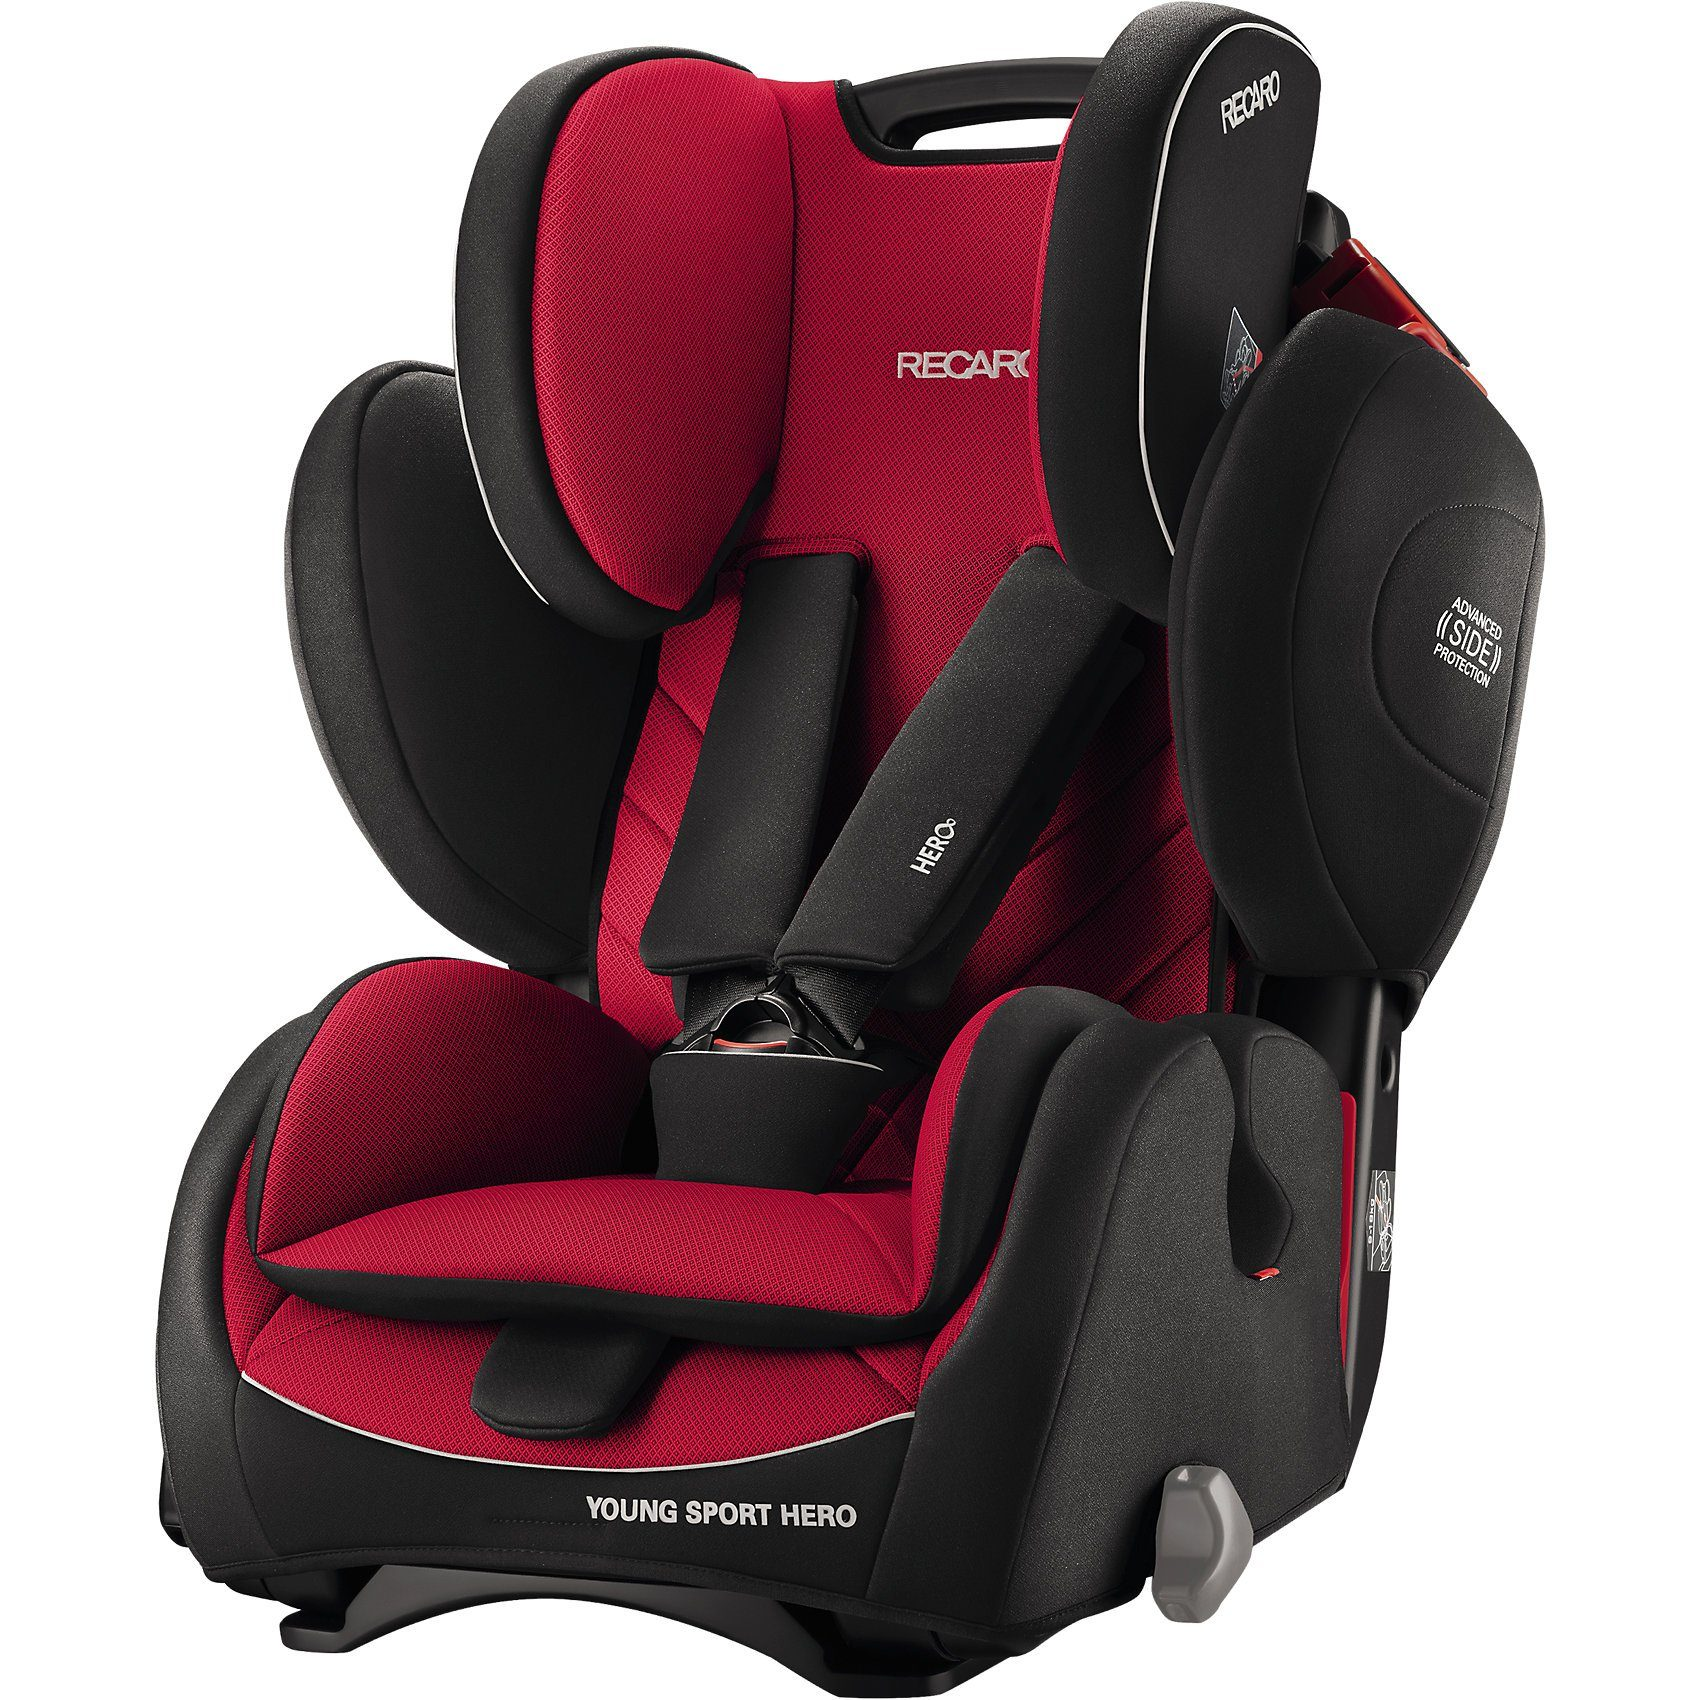 RECARO Auto-Kindersitz Young Sport HERO, Racing Red